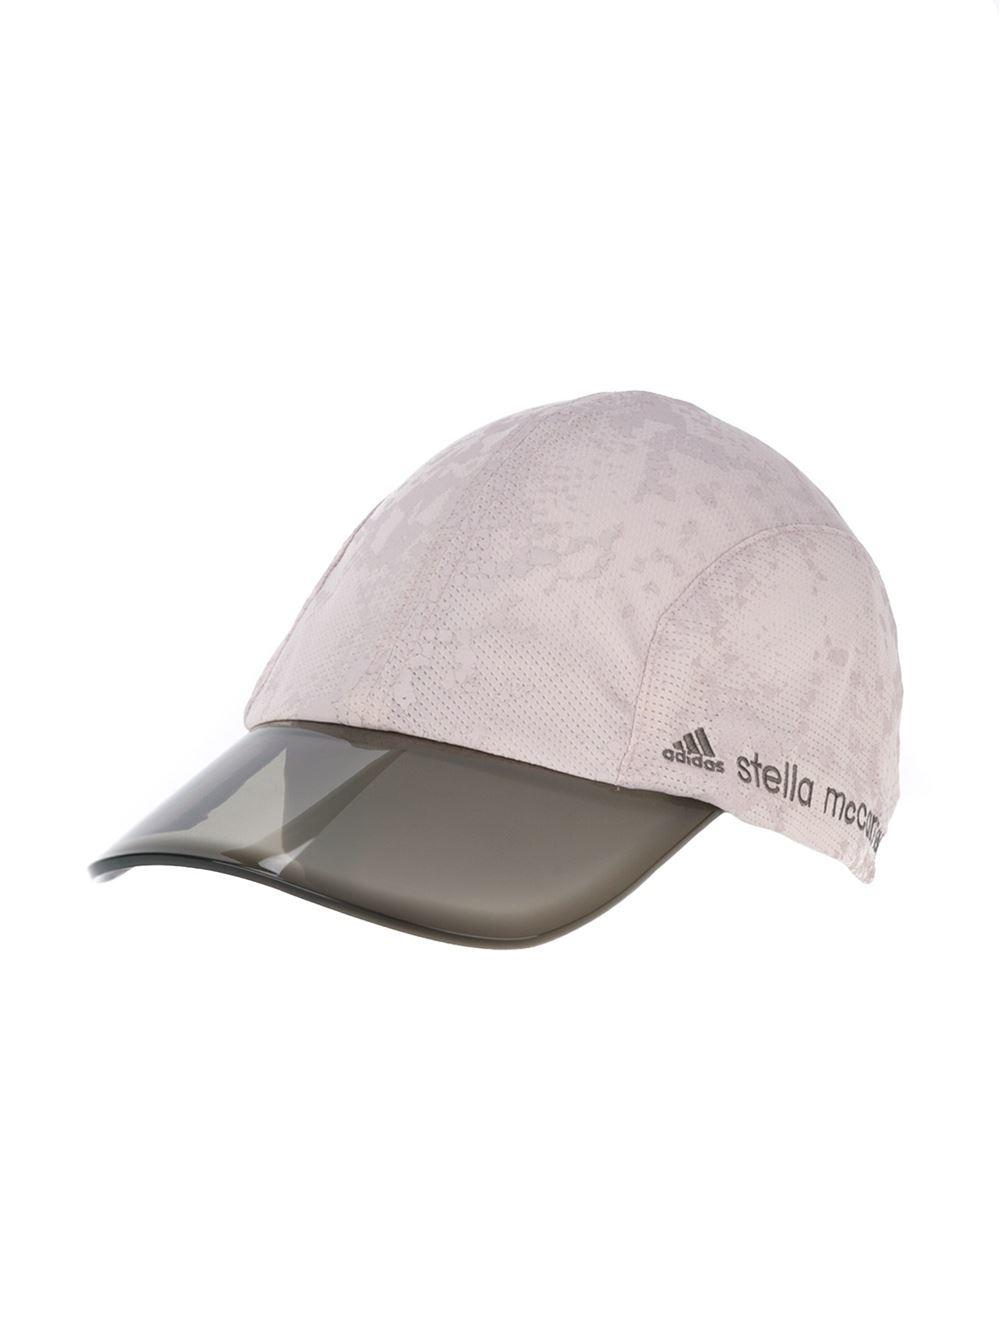 adidas By Stella McCartney Bicolor Baseball Cap in Natural - Lyst 90332c49304